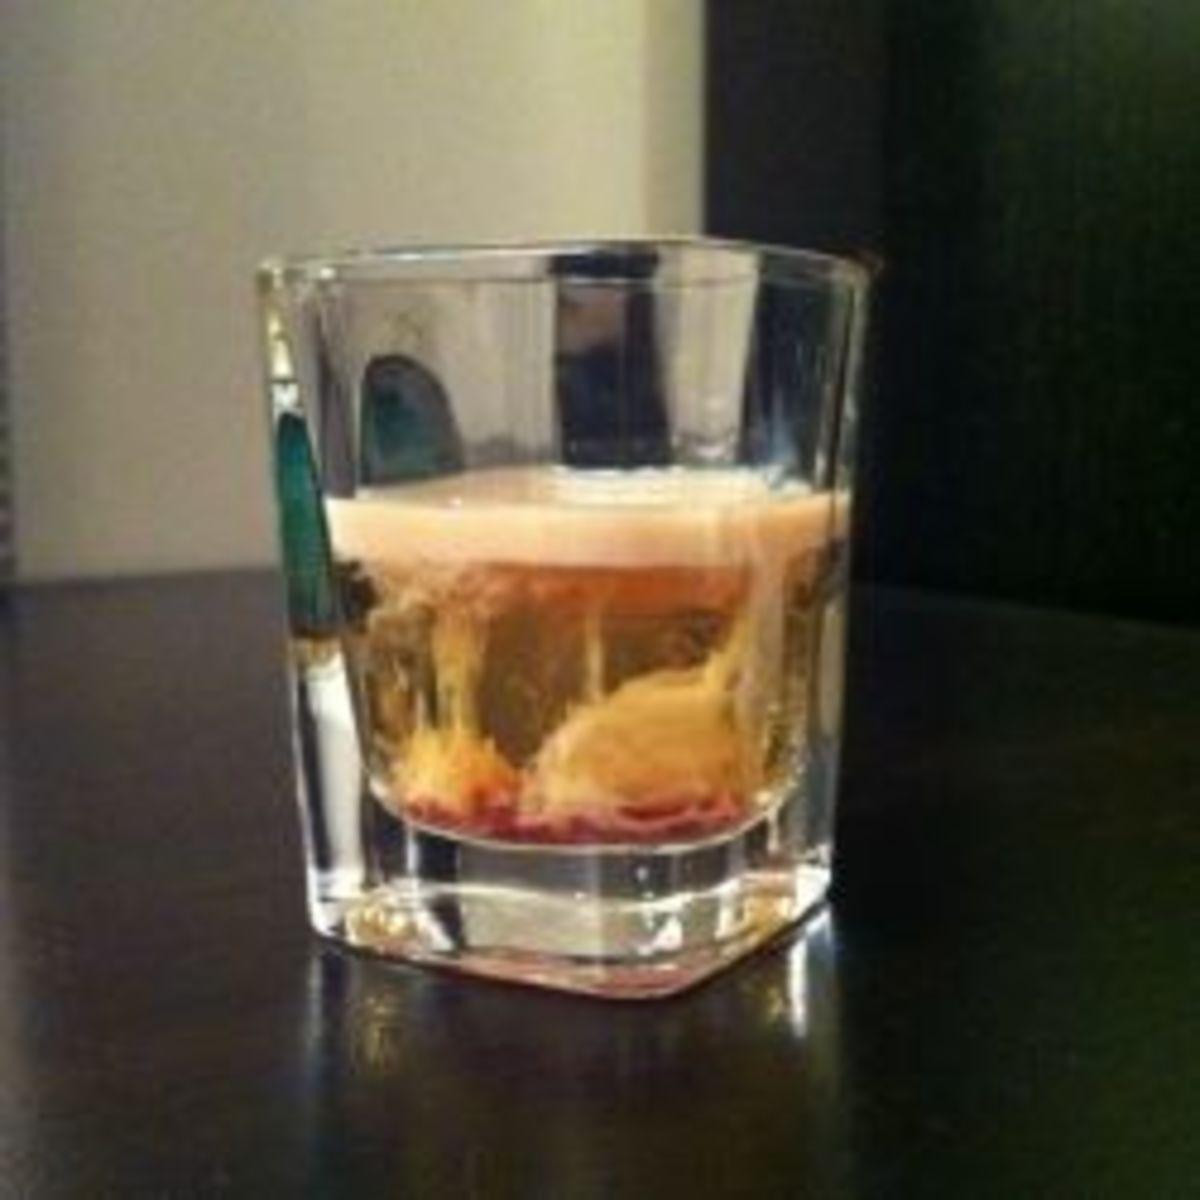 Brain Cocktail - Brain Haemorrhage